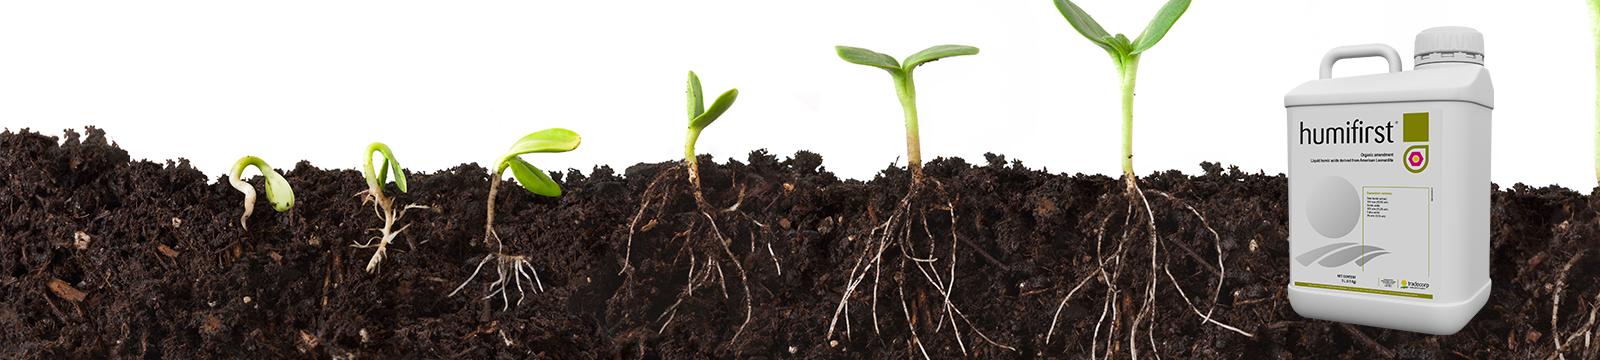 Ne cherchez plus vos racines avec Humifirst !